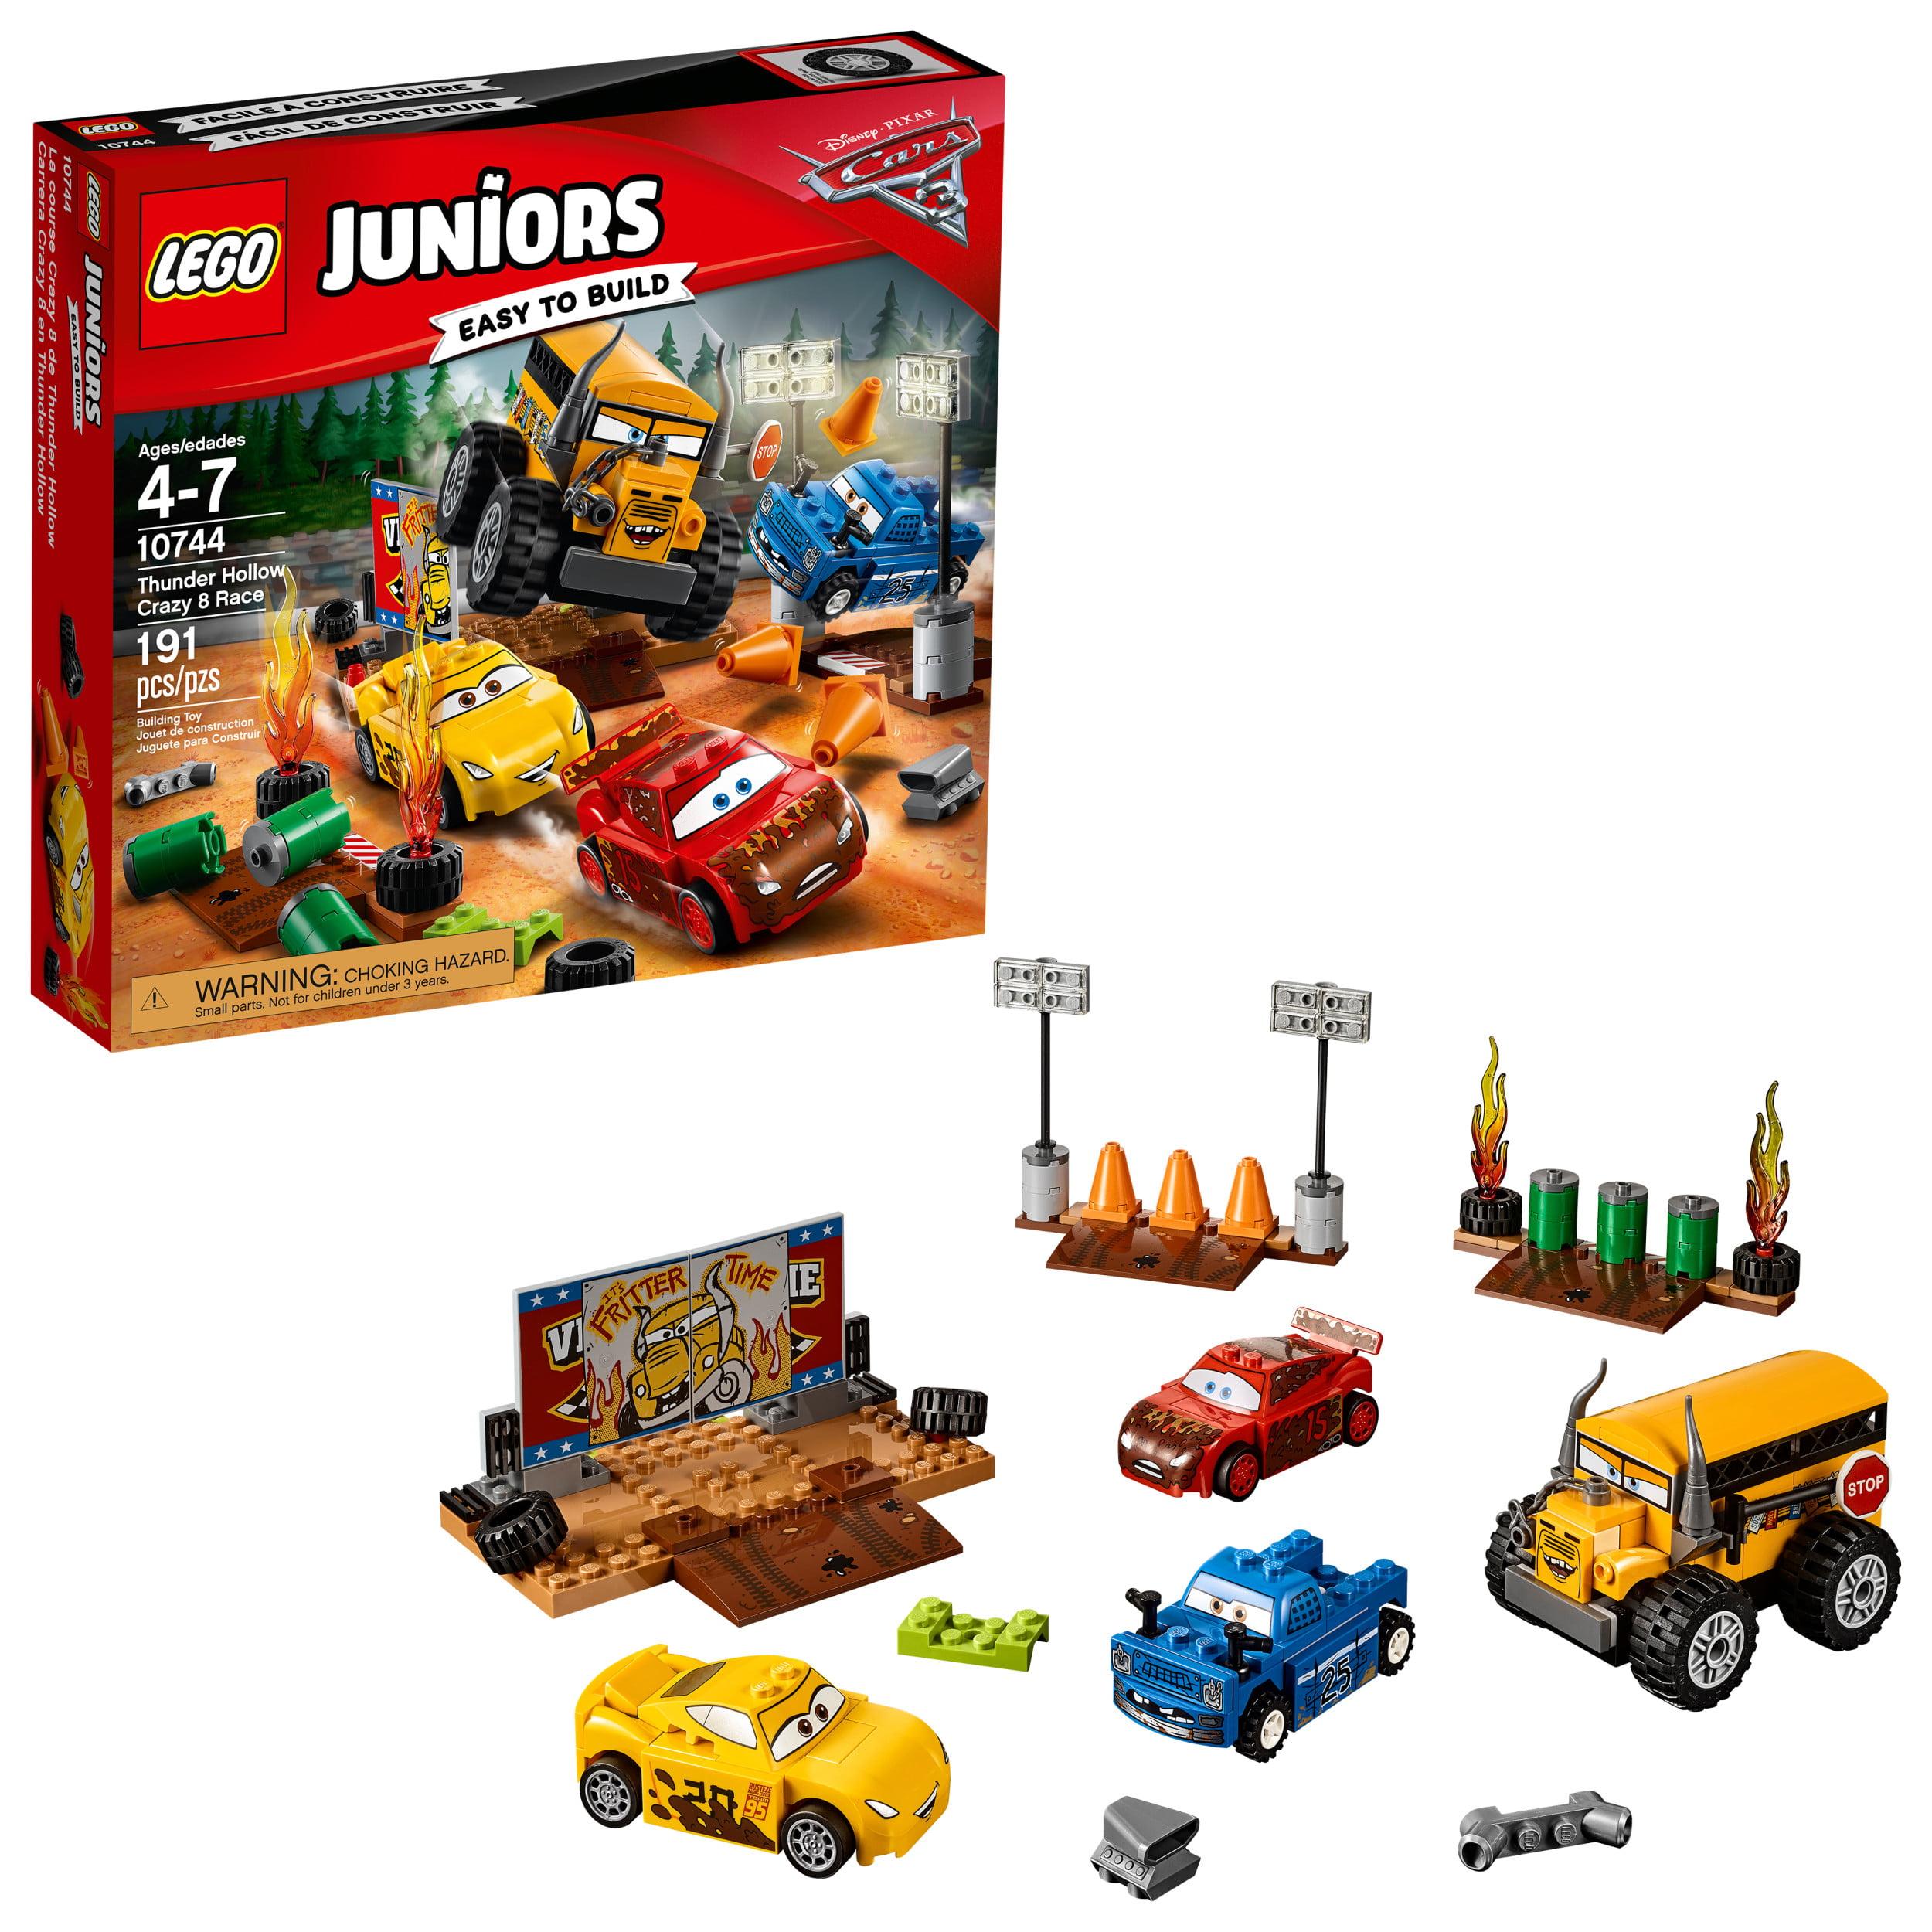 LEGO Juniors Thunder Hollow Crazy 8 Race 10744 (191 Pieces)